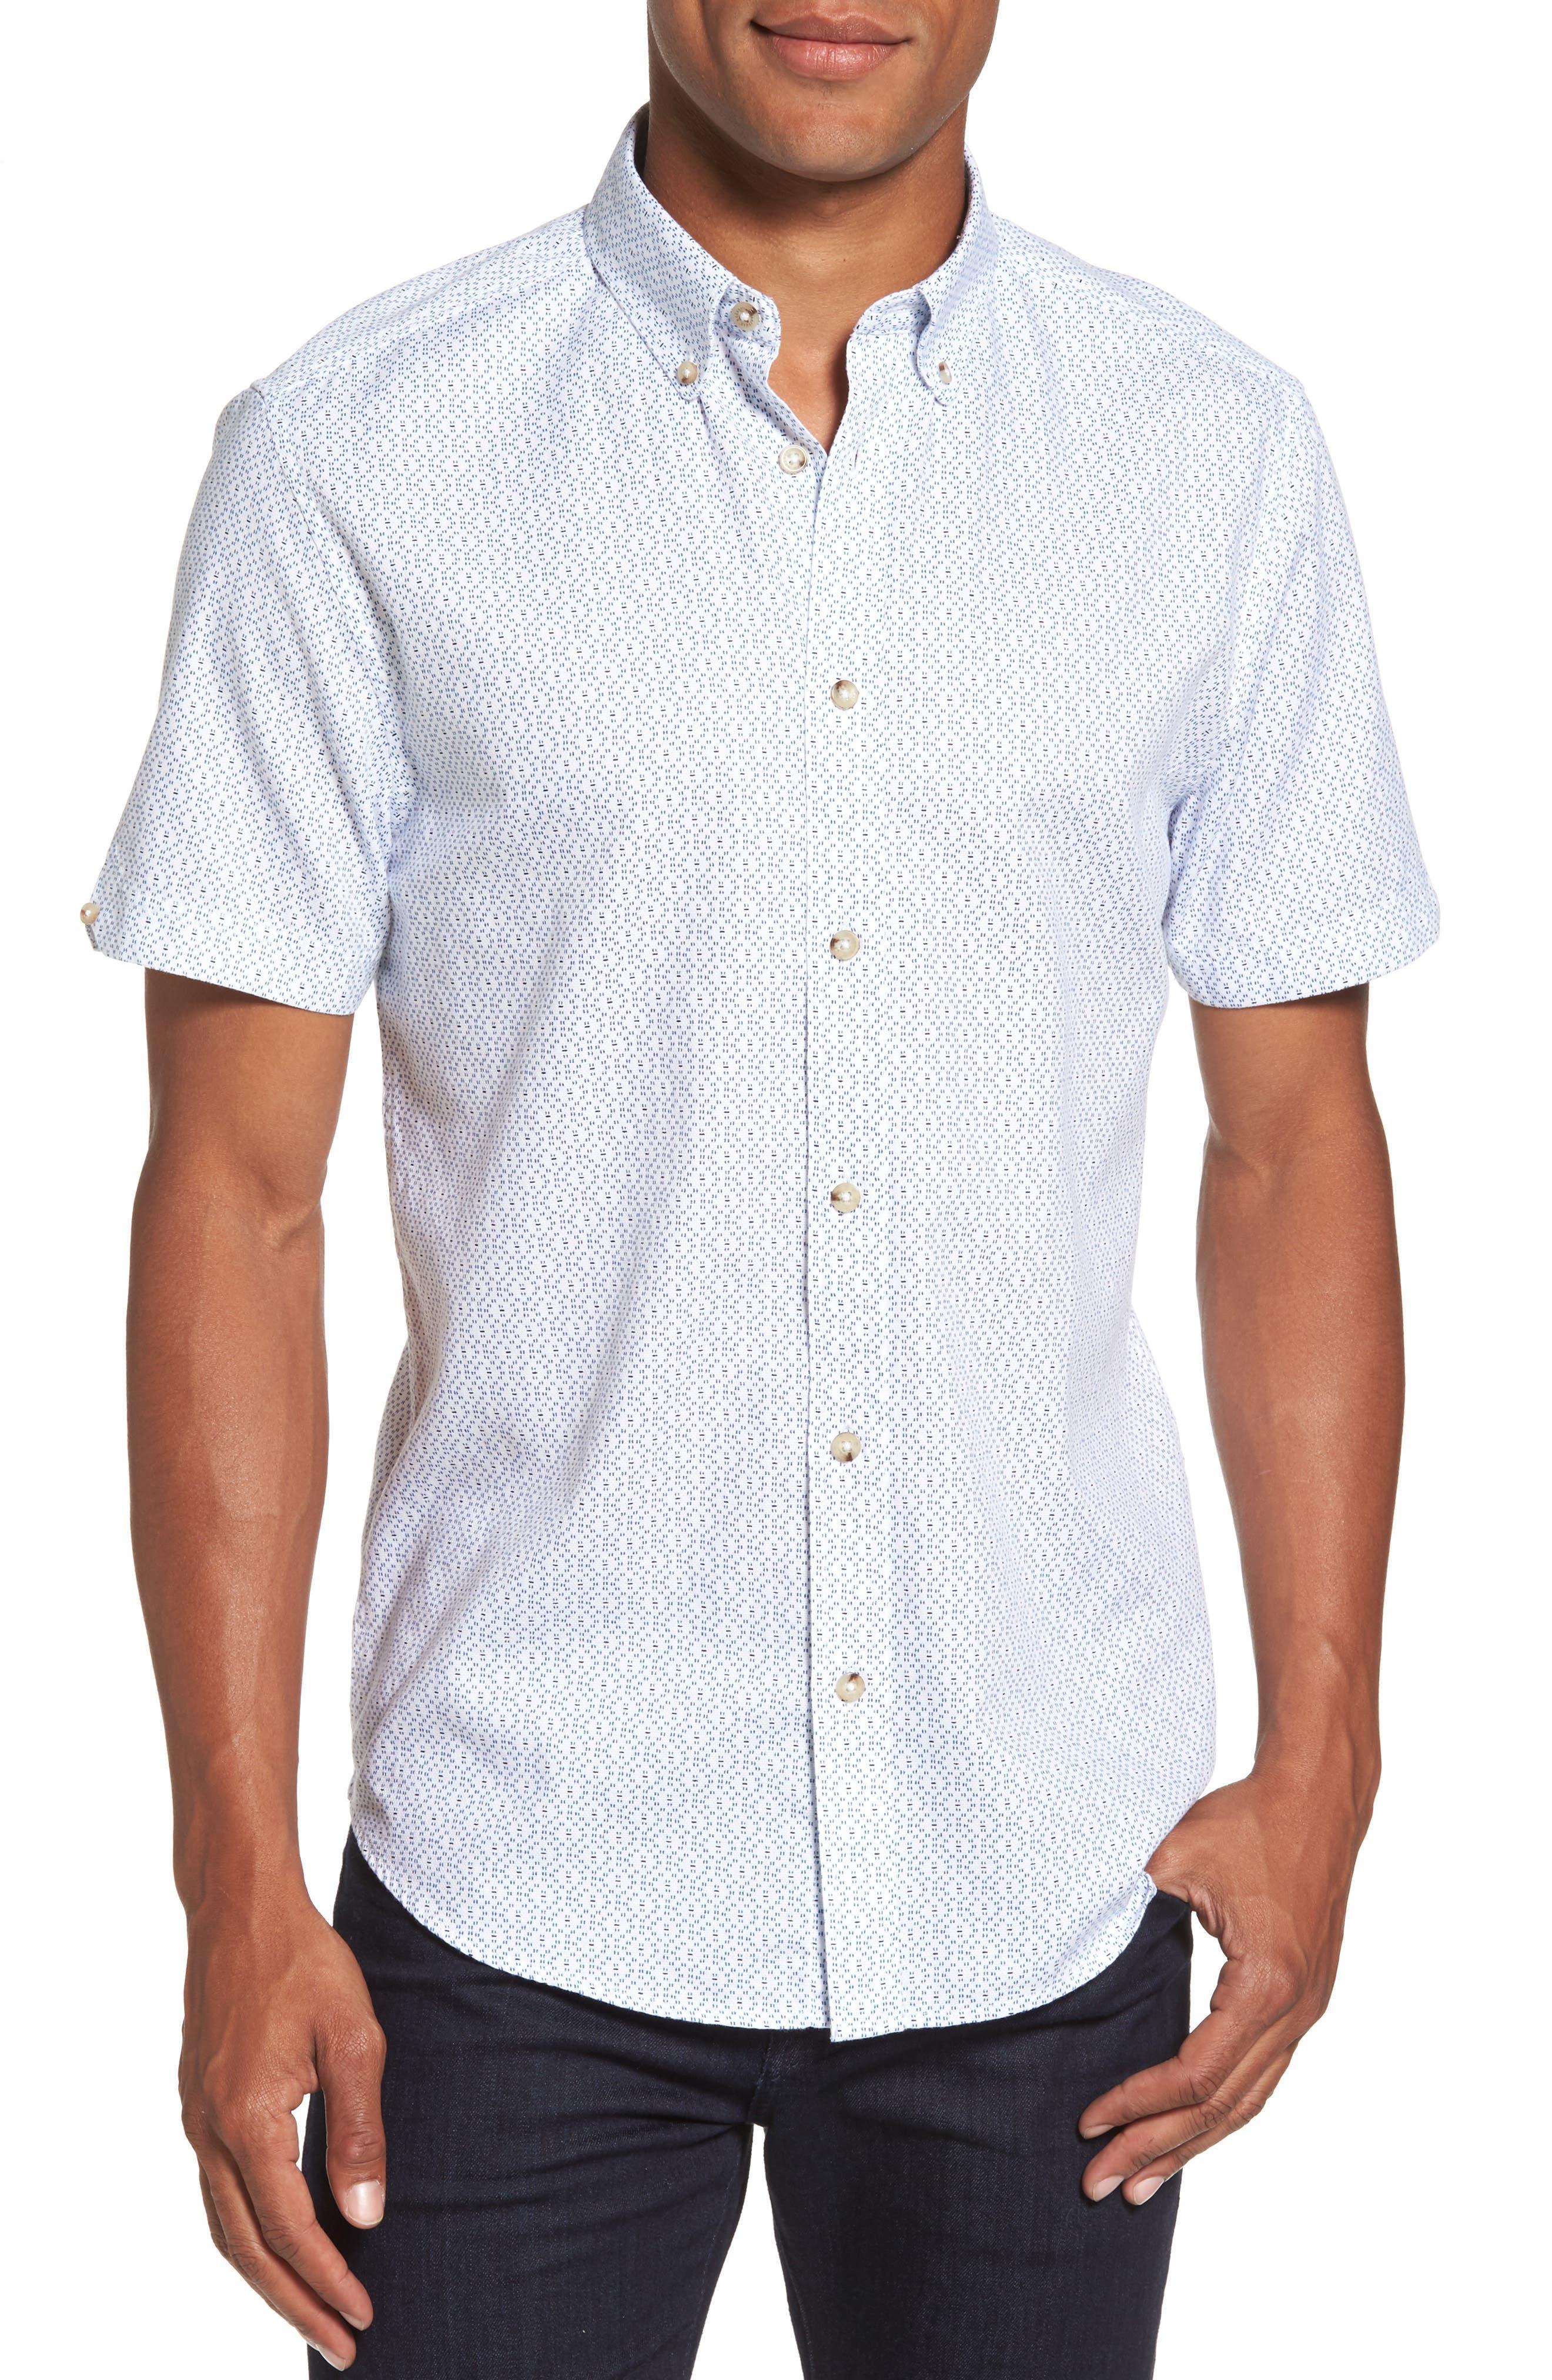 Ben Sherman Textured Dash Print Short Sleeve Shirt